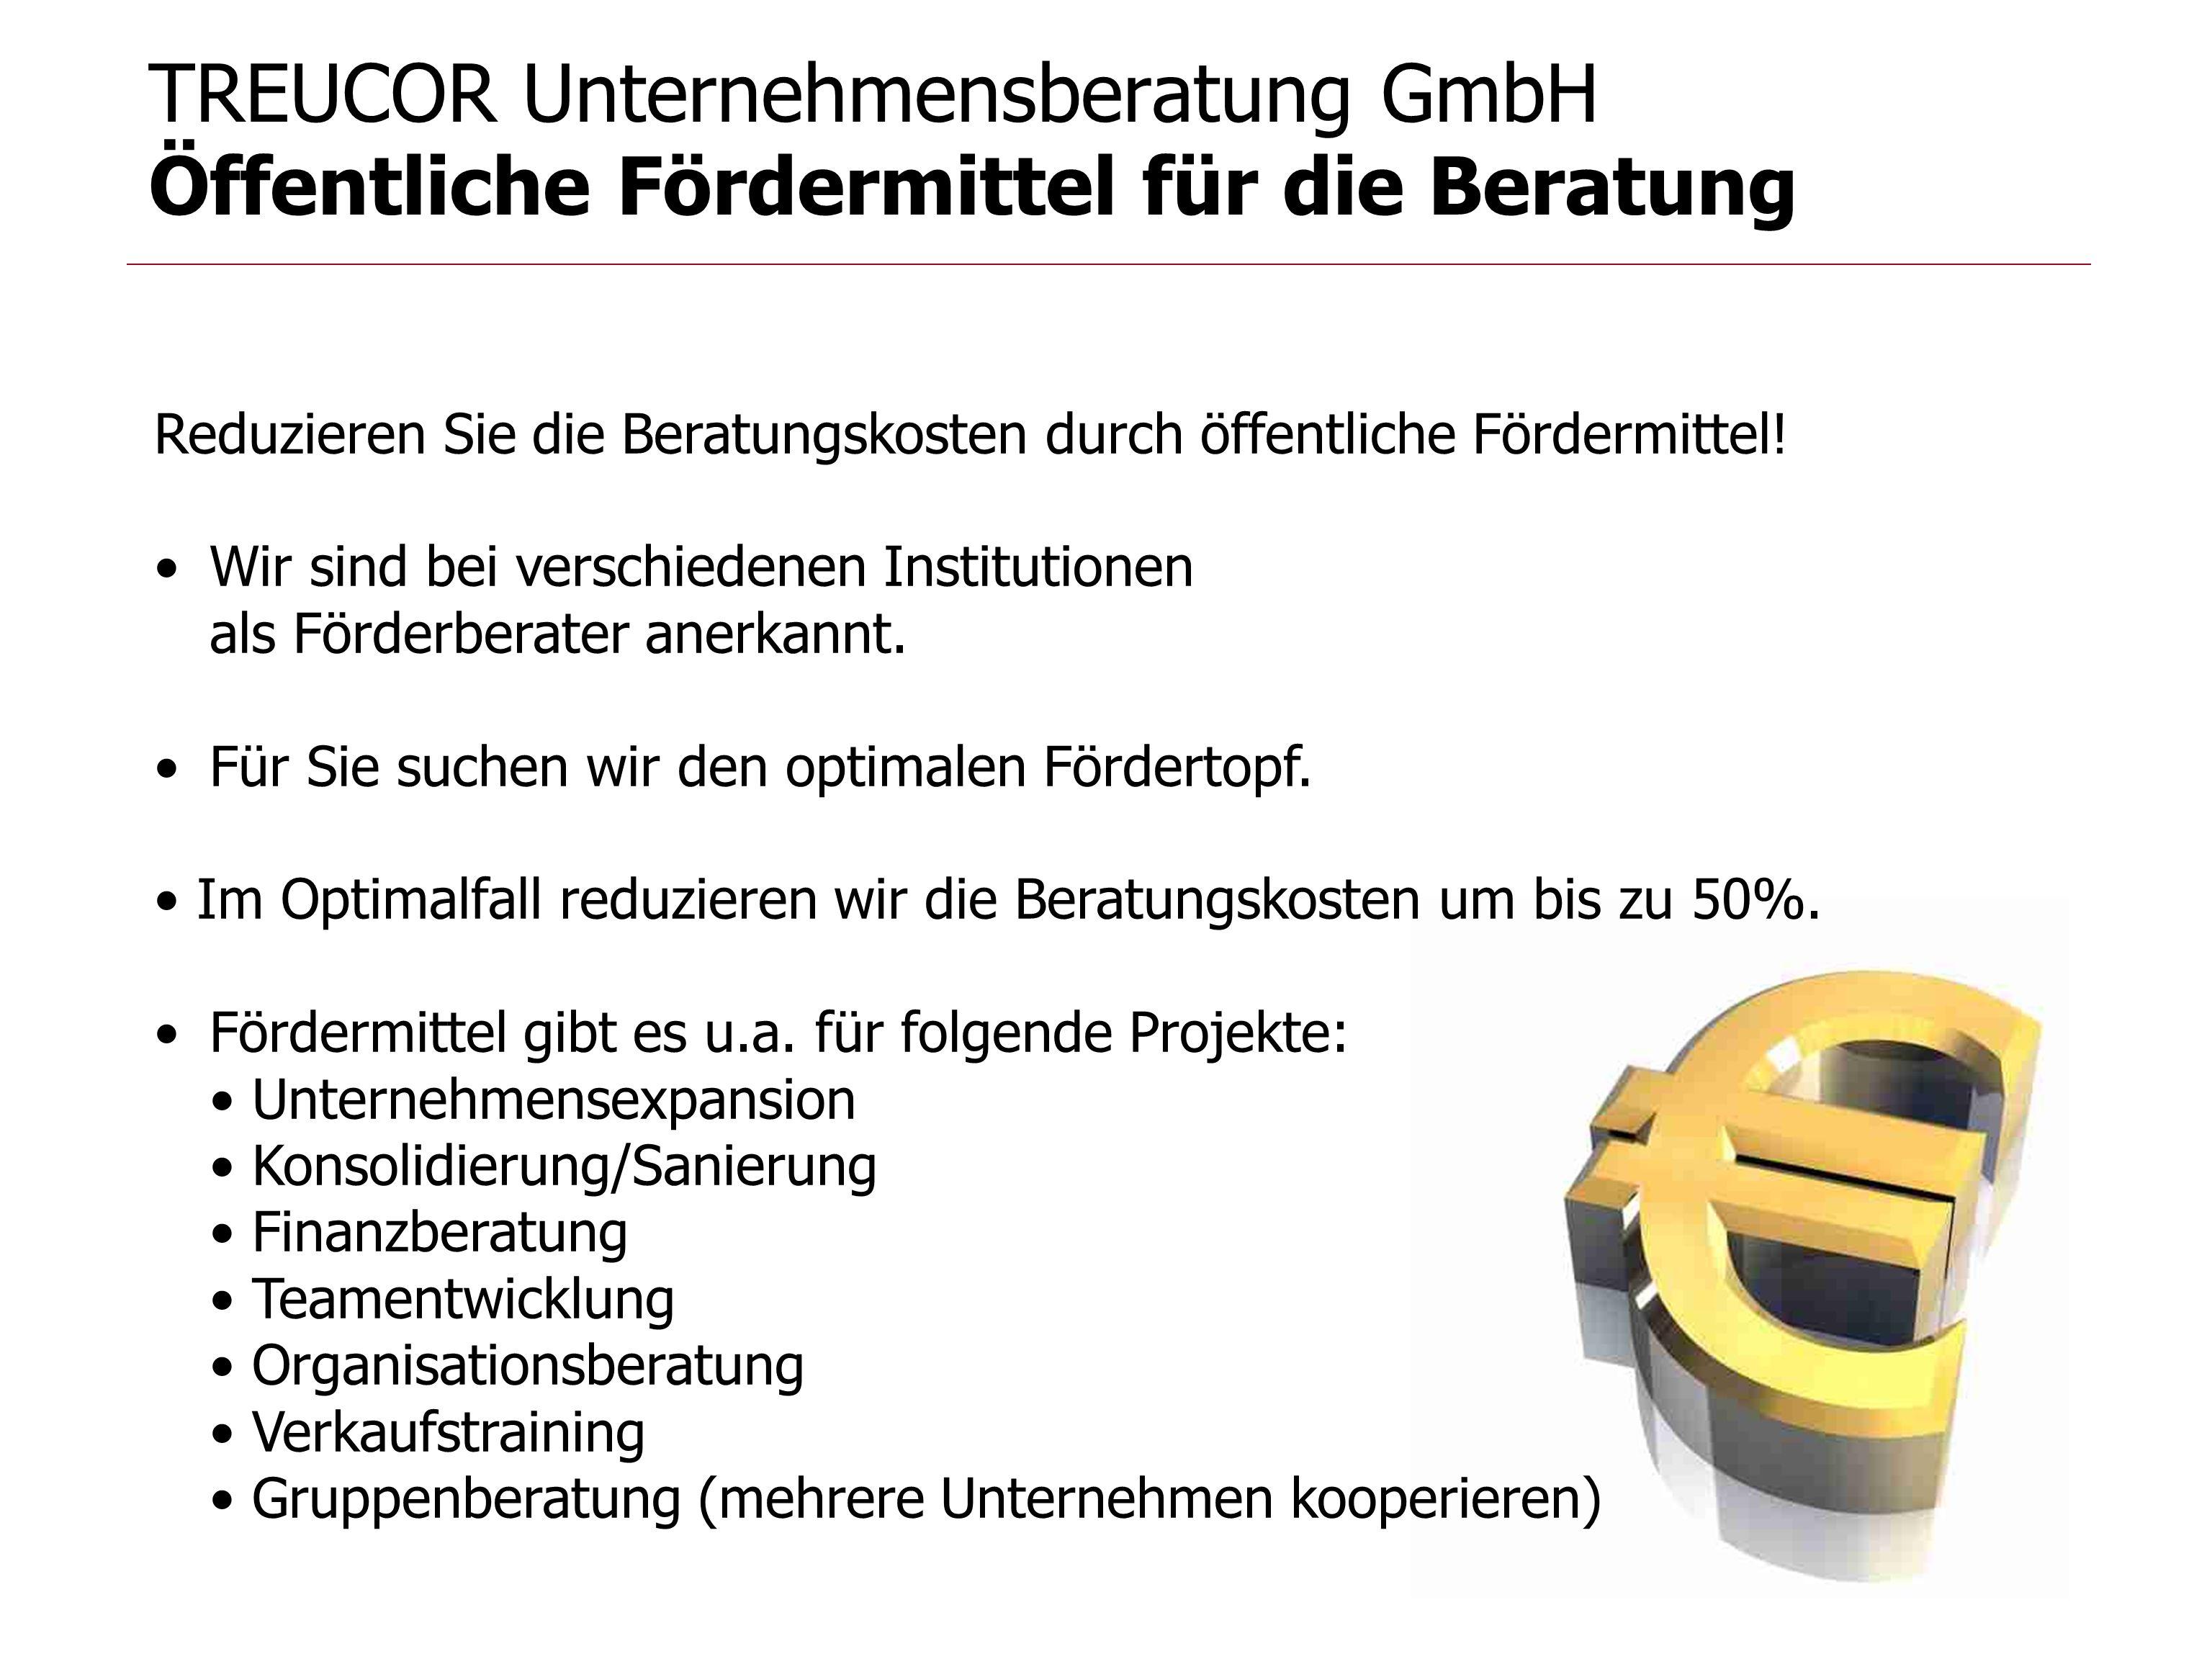 TREUCOR Unternehmensberatung GmbH